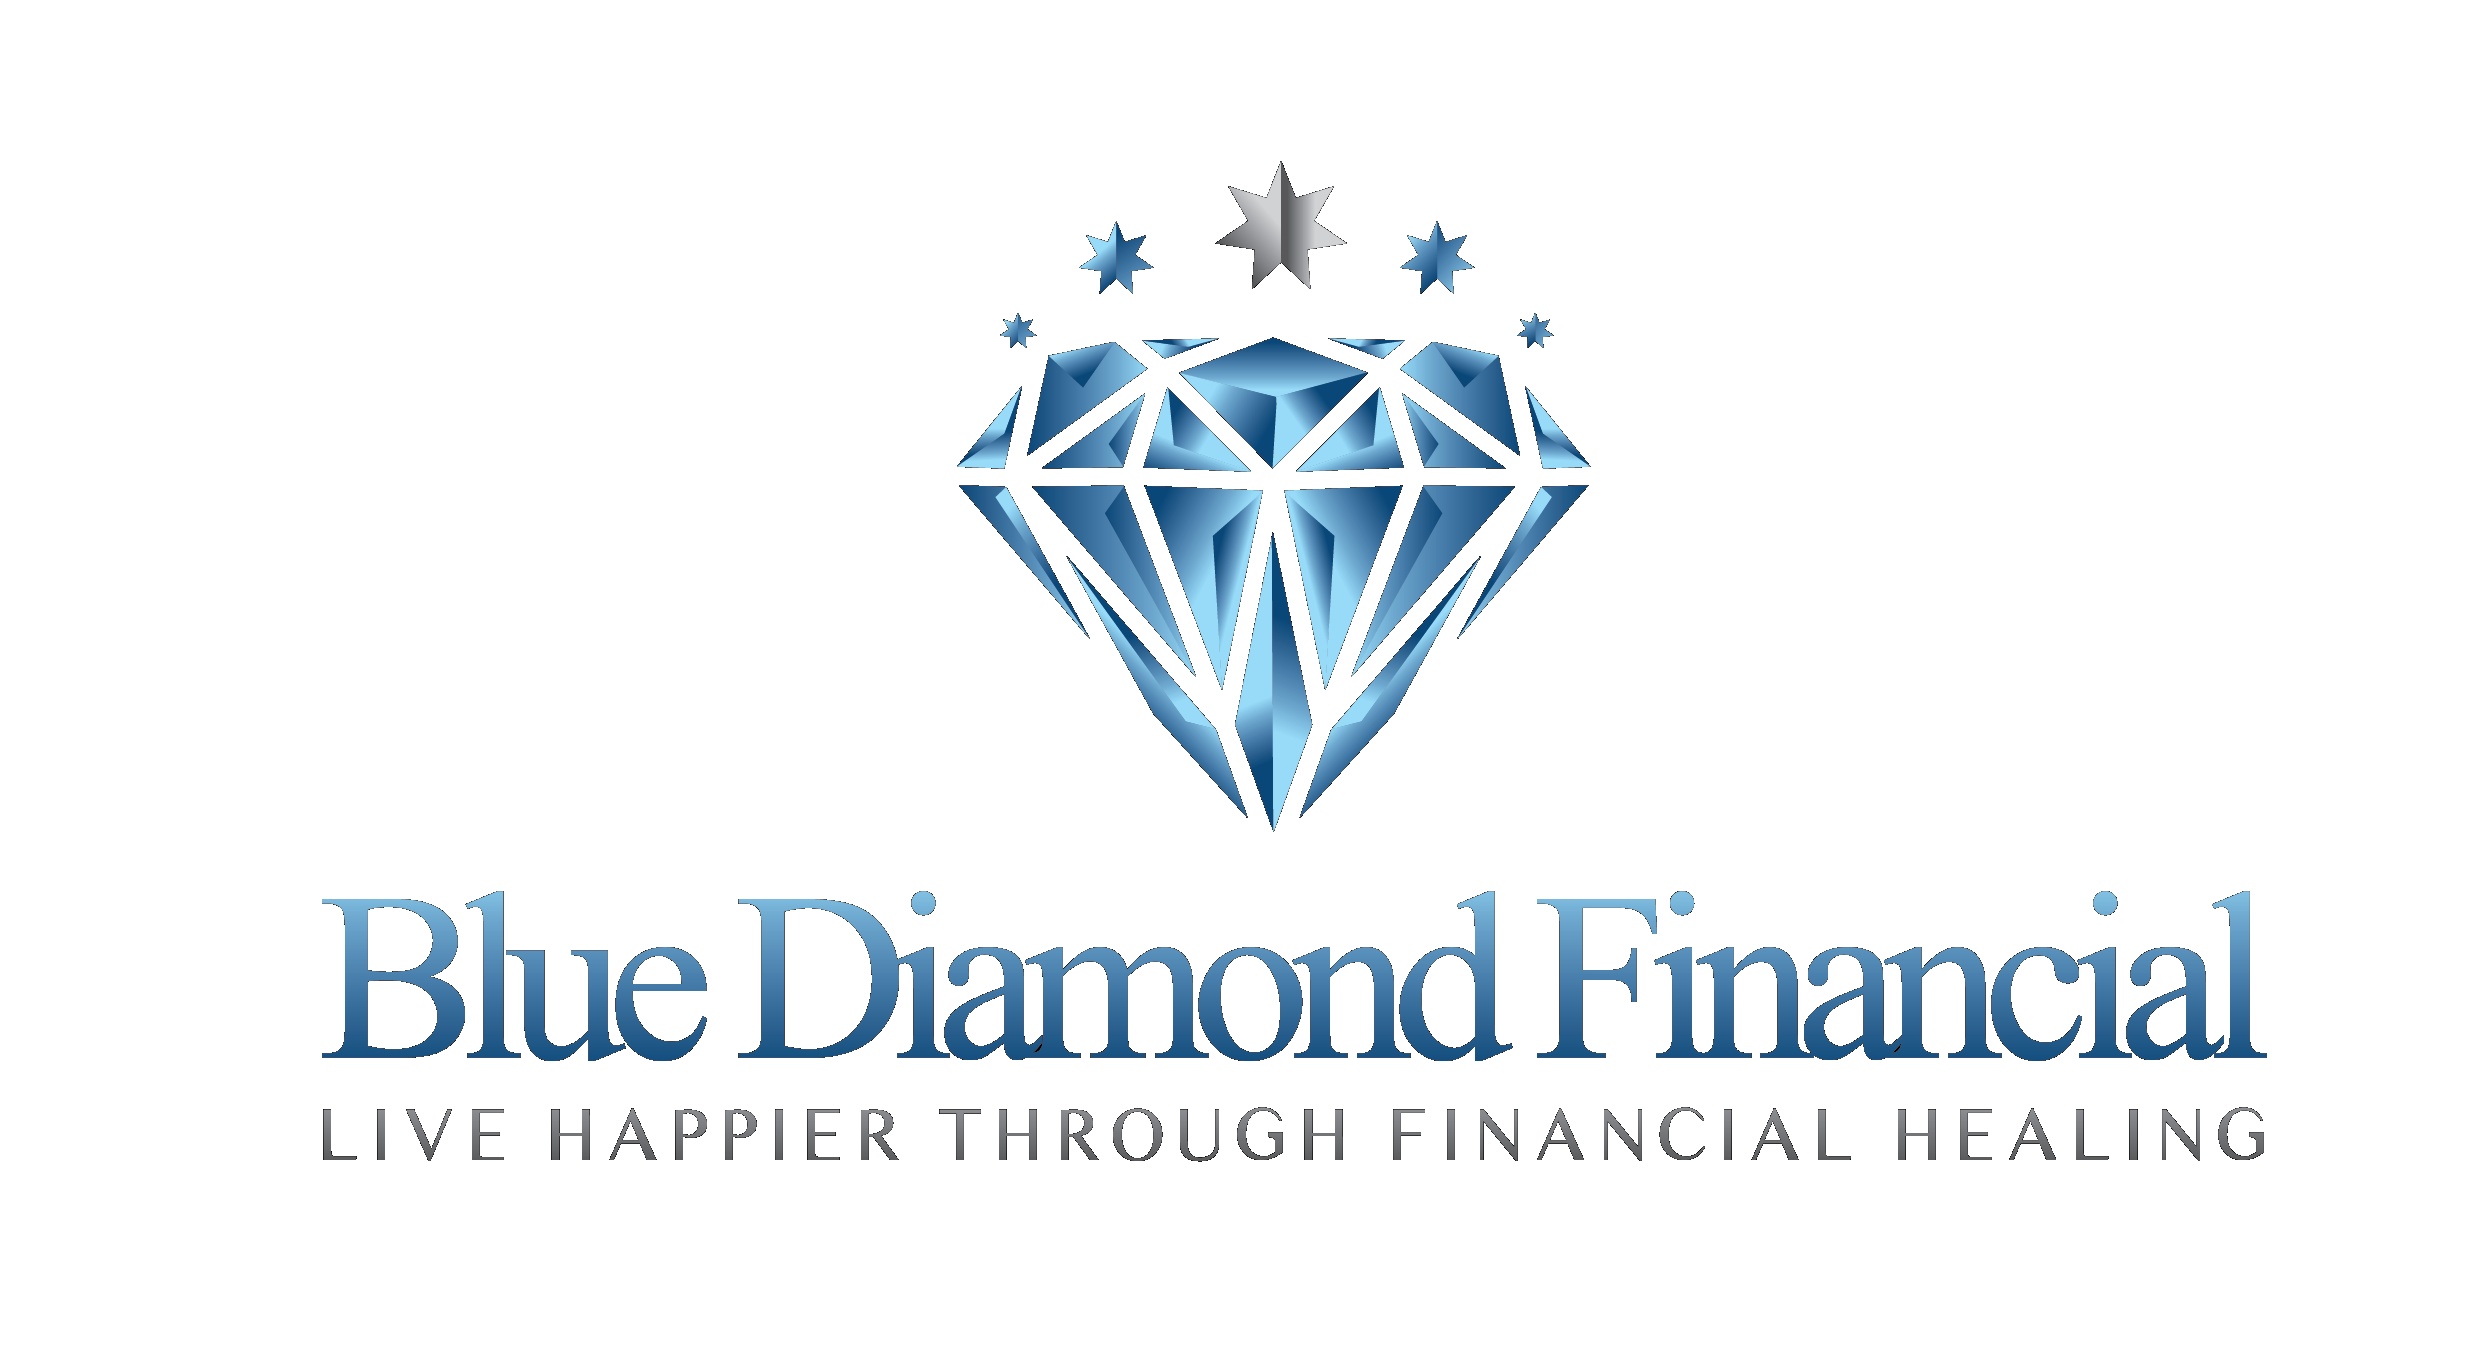 Blue Diamond Financial Planner Sydney